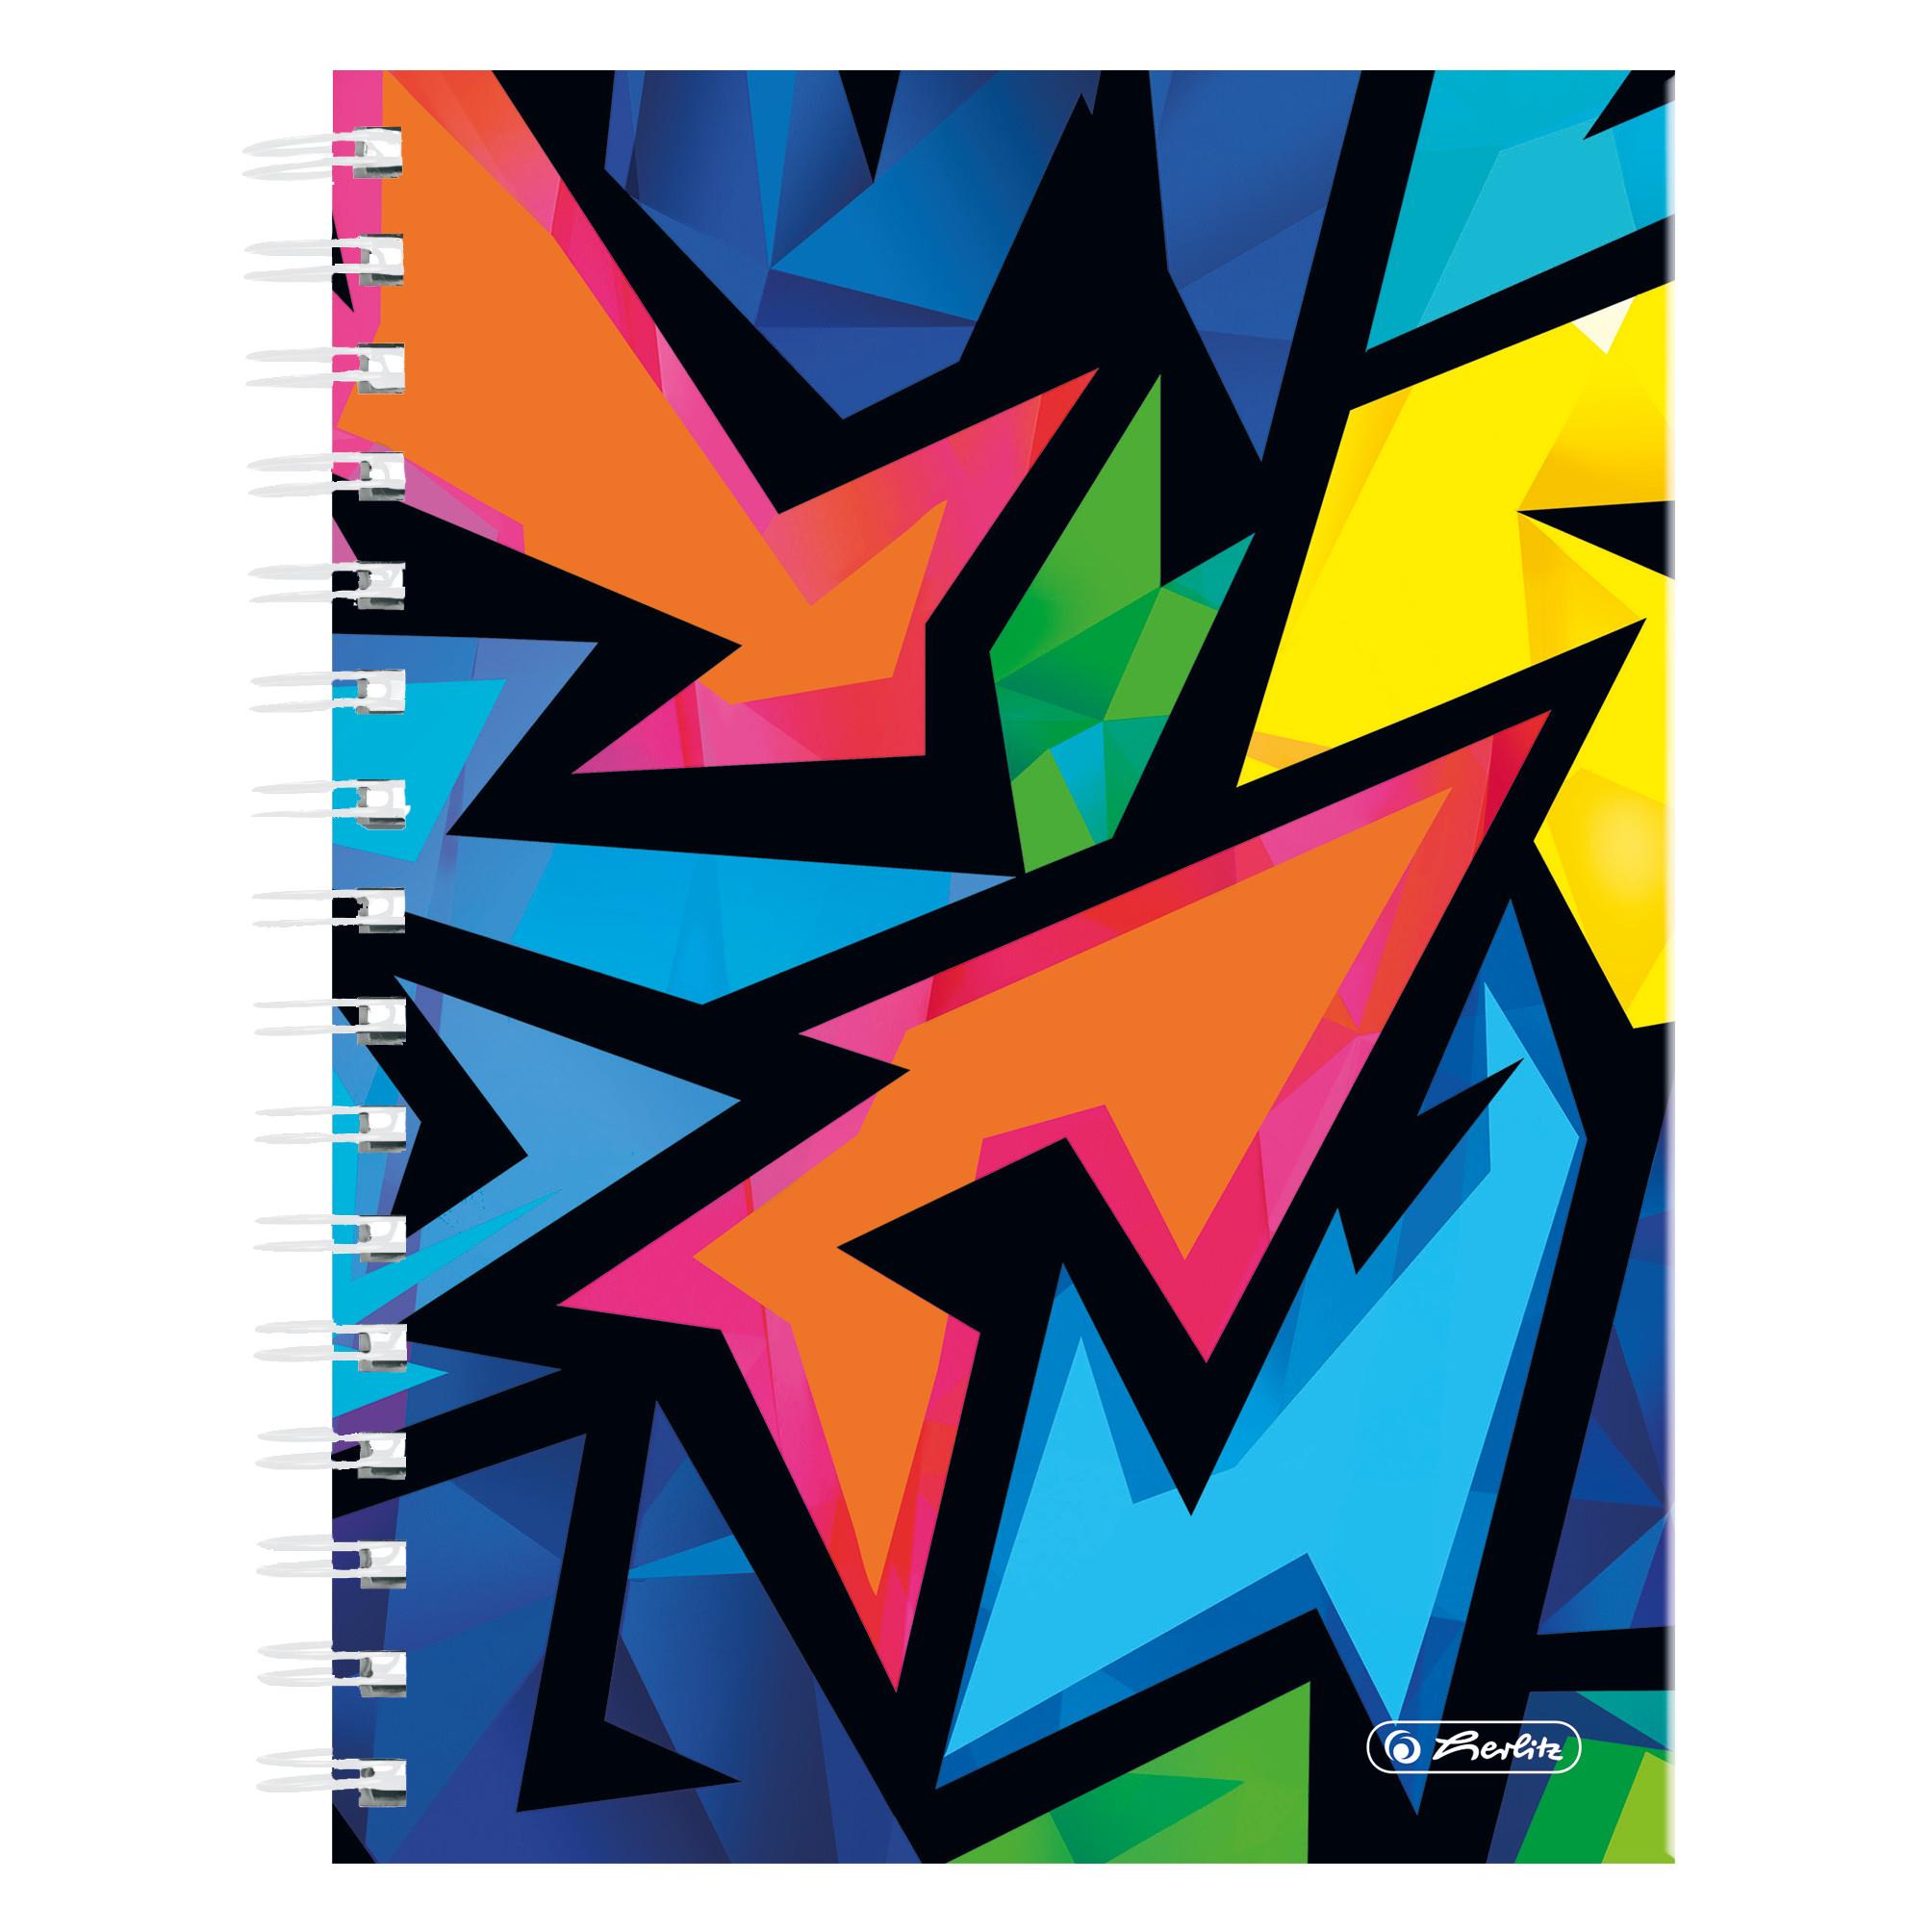 Herlitz Neon Art - Muster - Mehrfarbig - A5 - 100 Blätter - 70 g/m² - Kariertes Papier